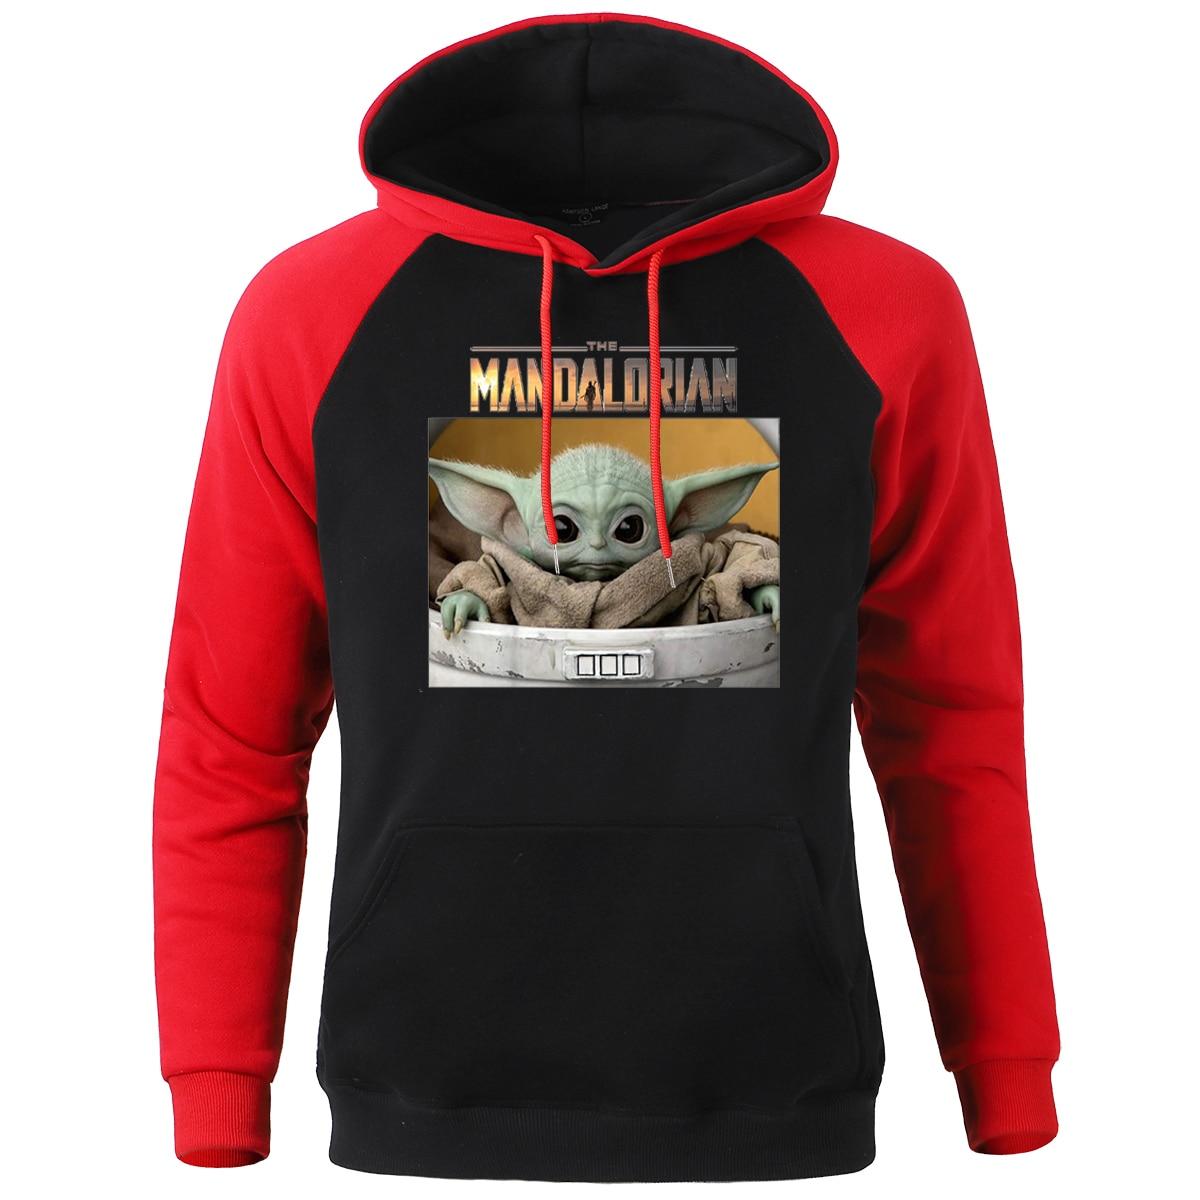 The Mandalorian Child Baby Yoda Cute Hoodies Men Star Wars Hoody Sweatshirt 2020 Spring Autumn Mens Sportswear Streetwear Hoodie